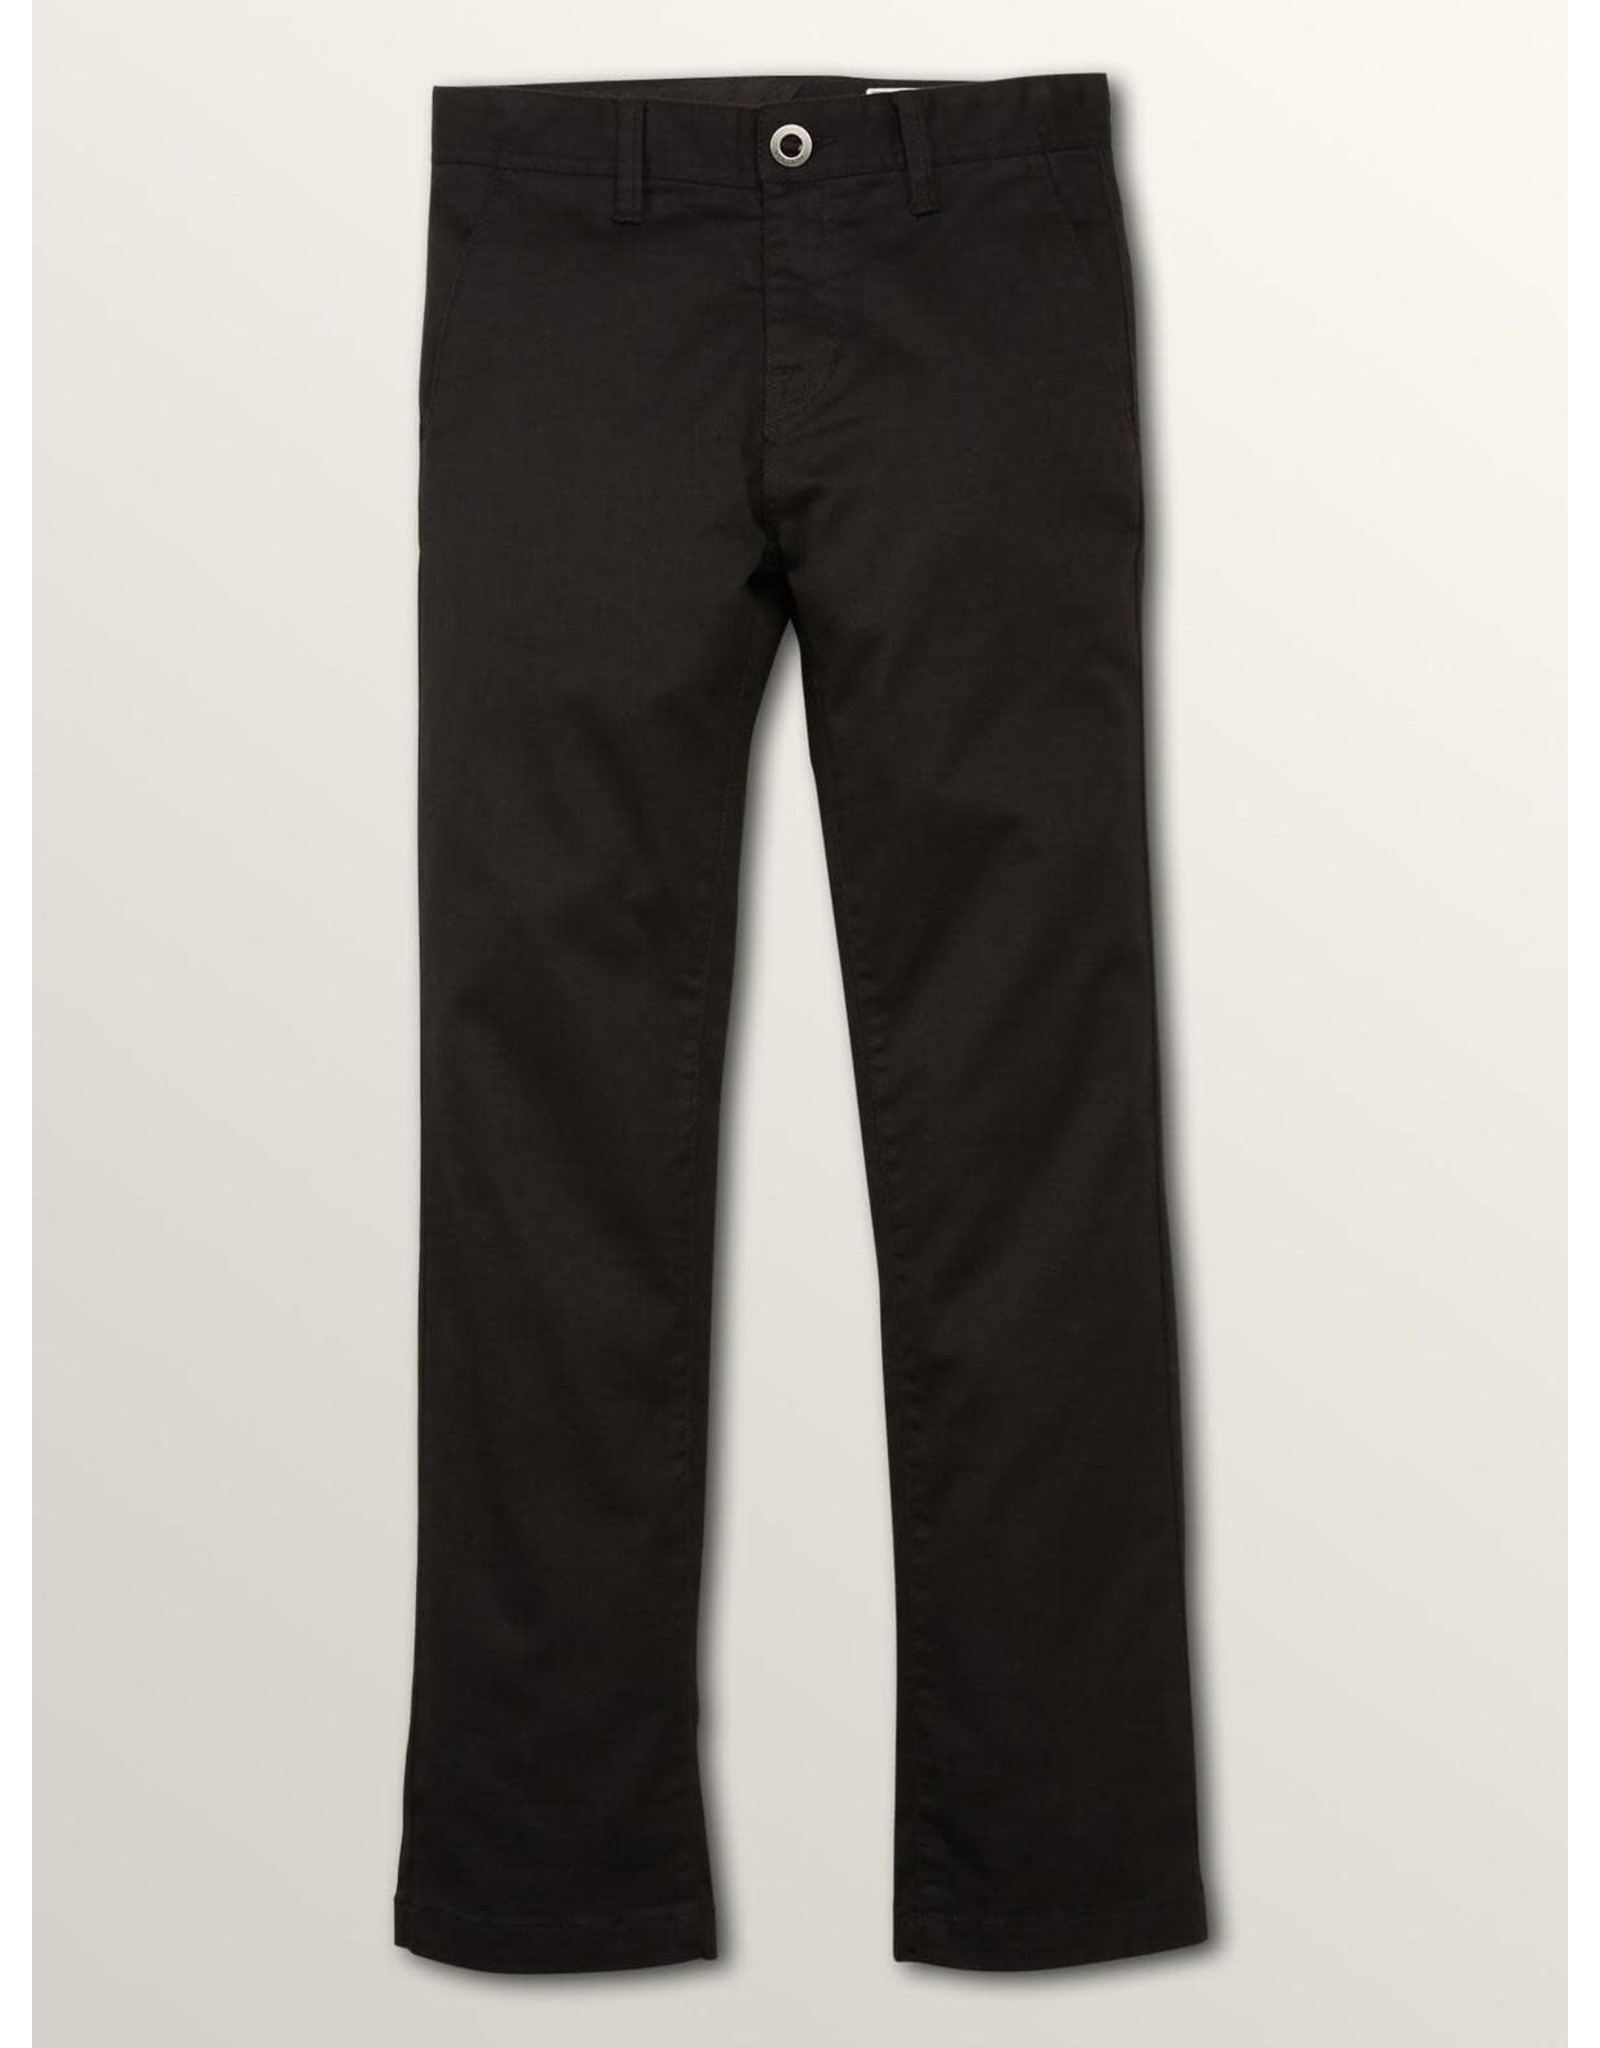 volcom Volcom - pantalon frickin modern straight